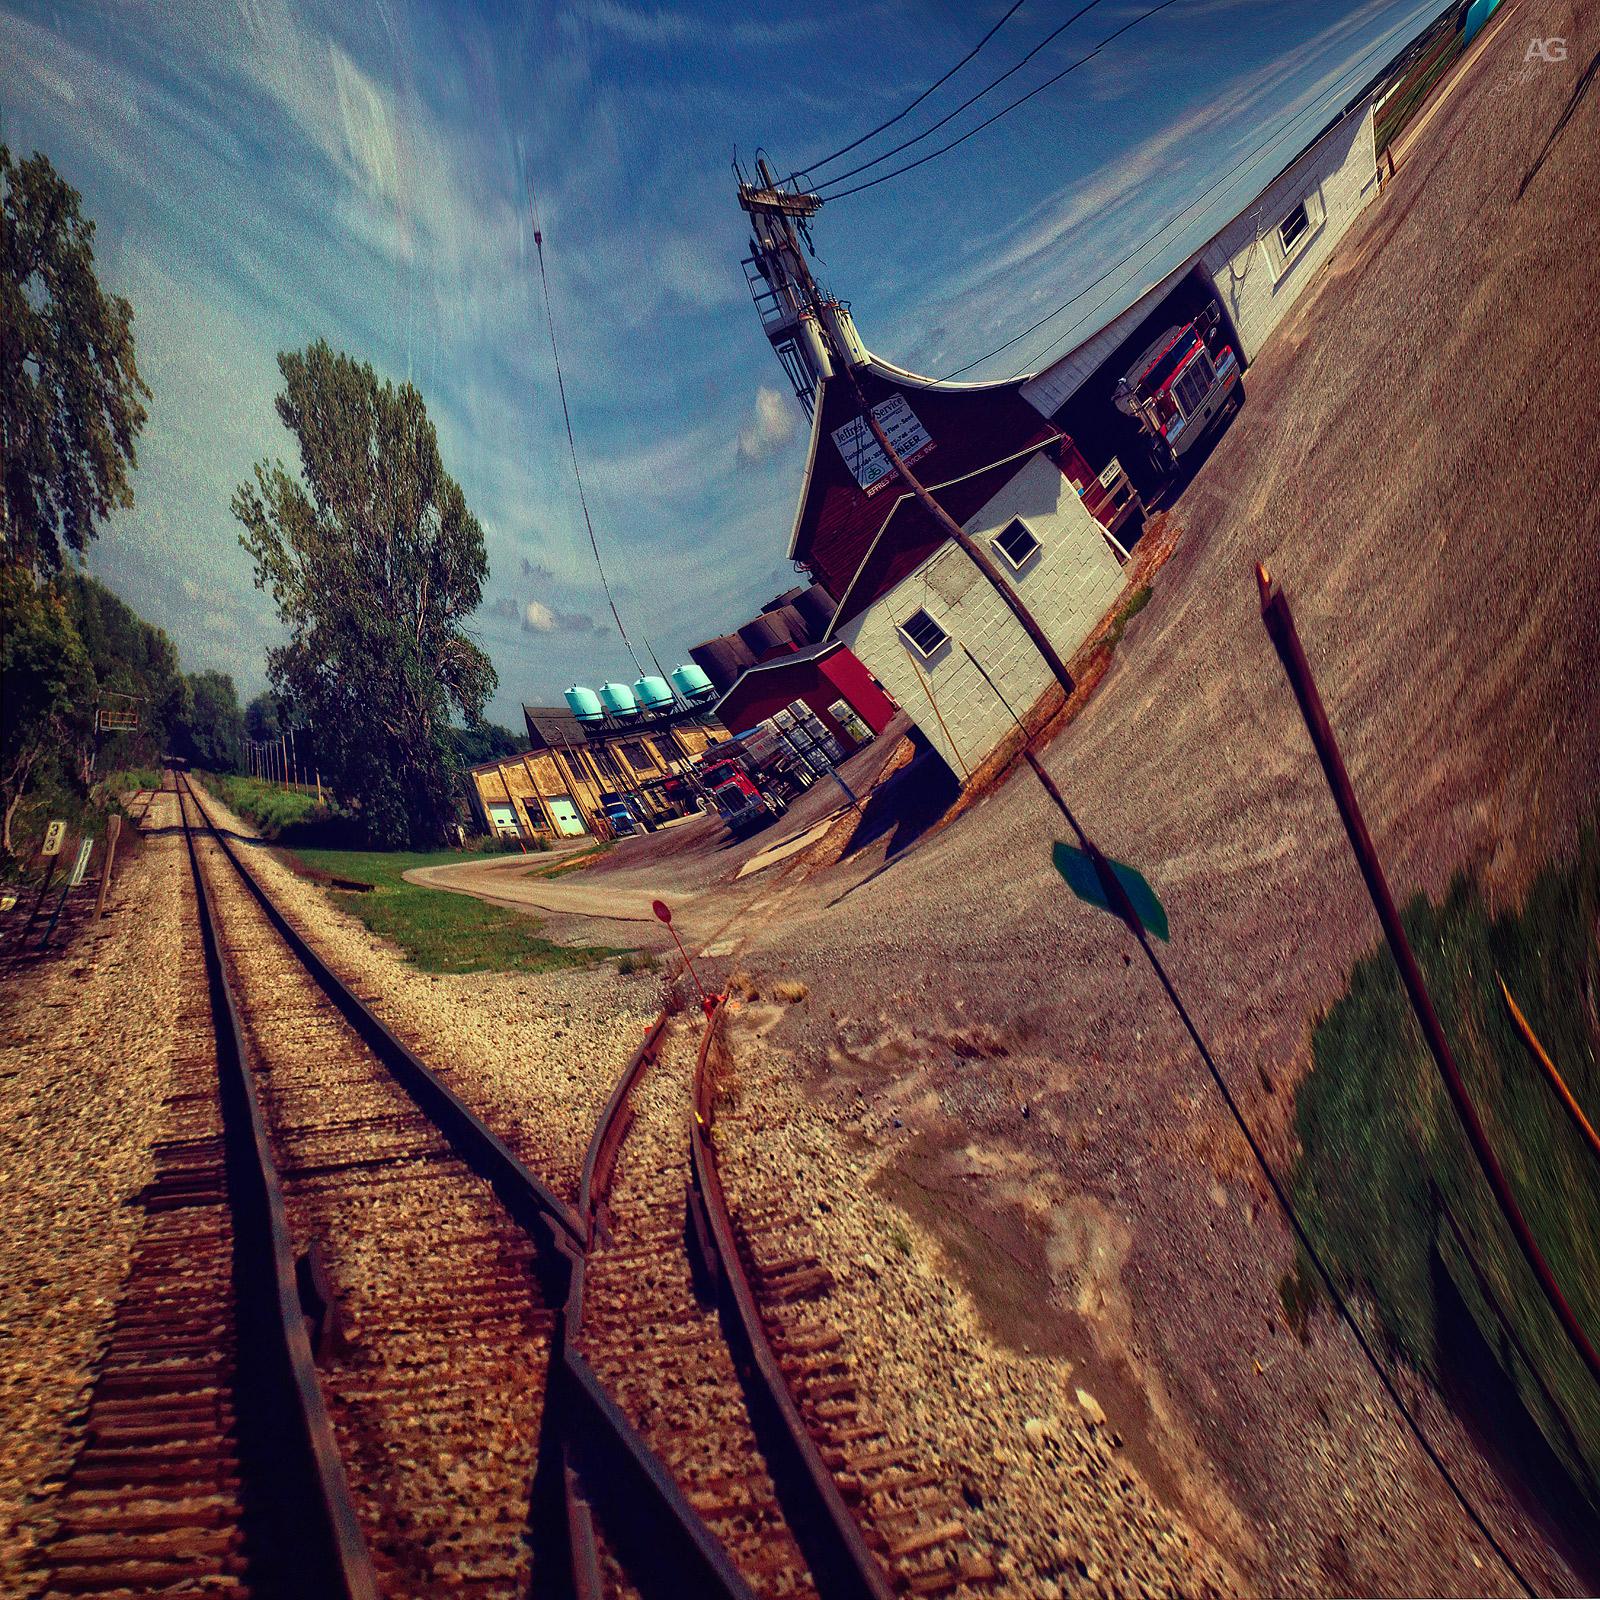 TrainTracksAndWhiteSmallHouseCloudyDayMiddleOfNowhere_warped_1600